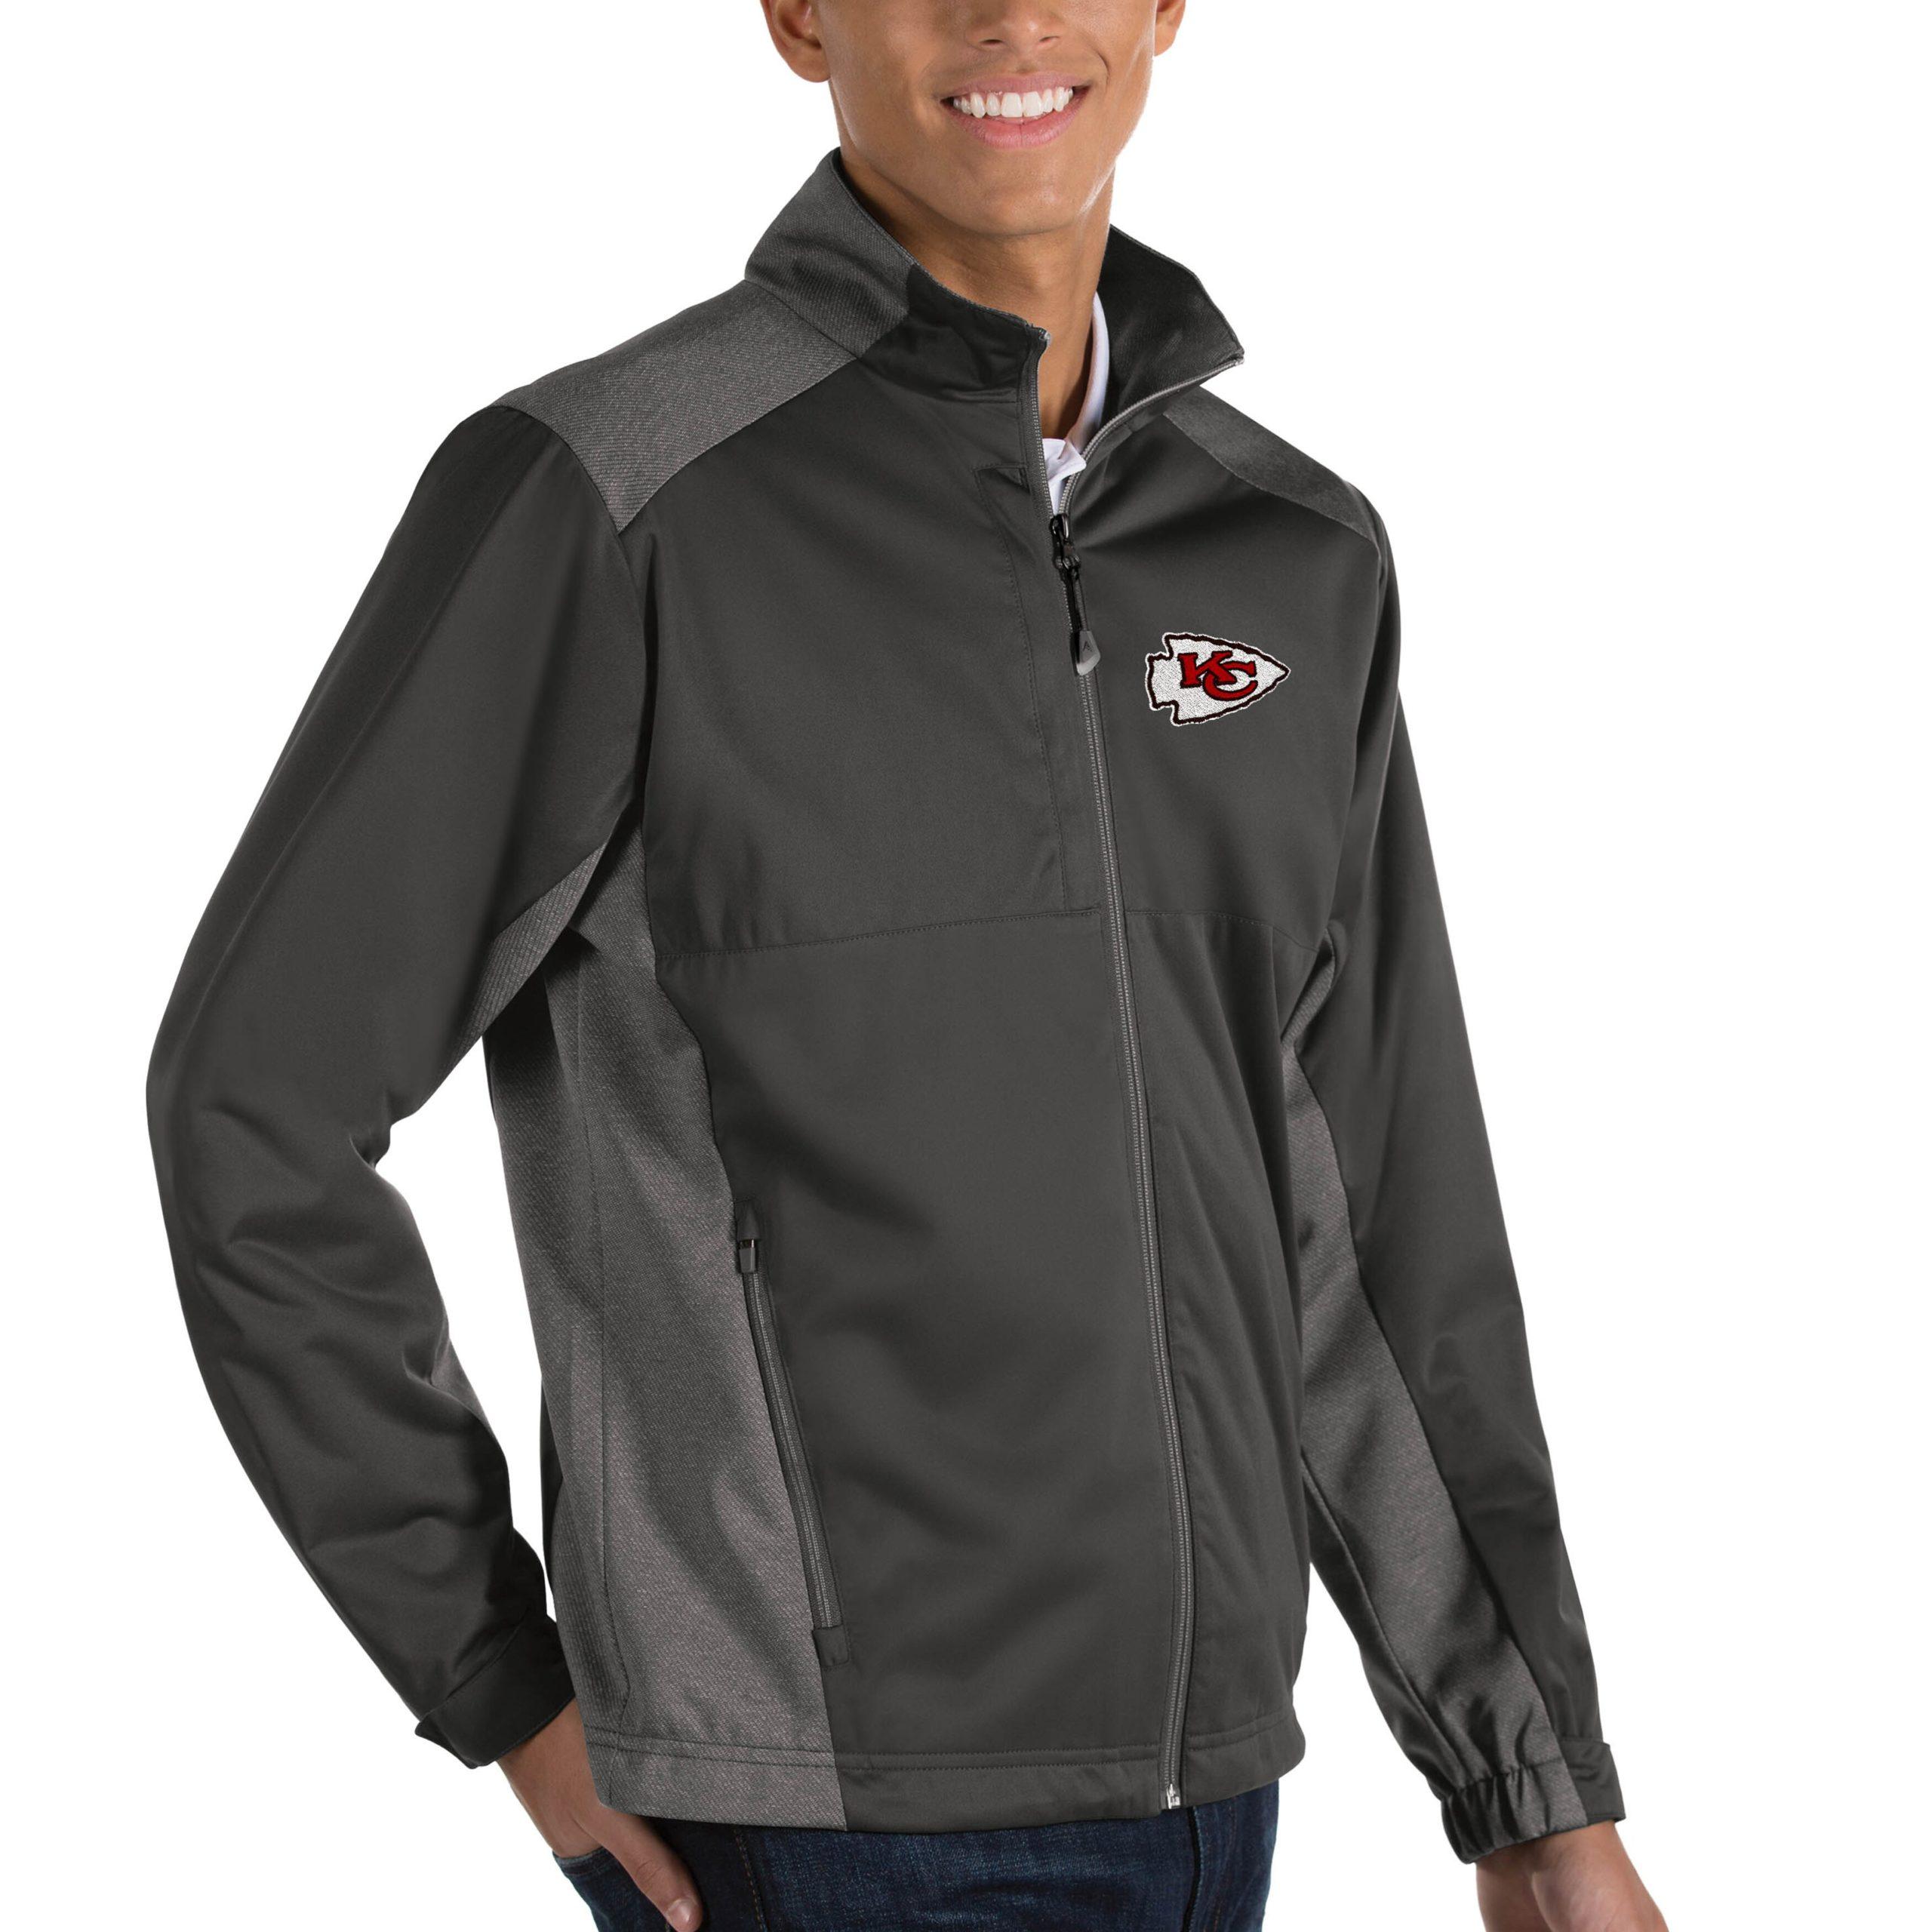 Kansas City Chiefs Antigua Revolve Big & Tall Full-Zip Jacket - Heather Charcoal